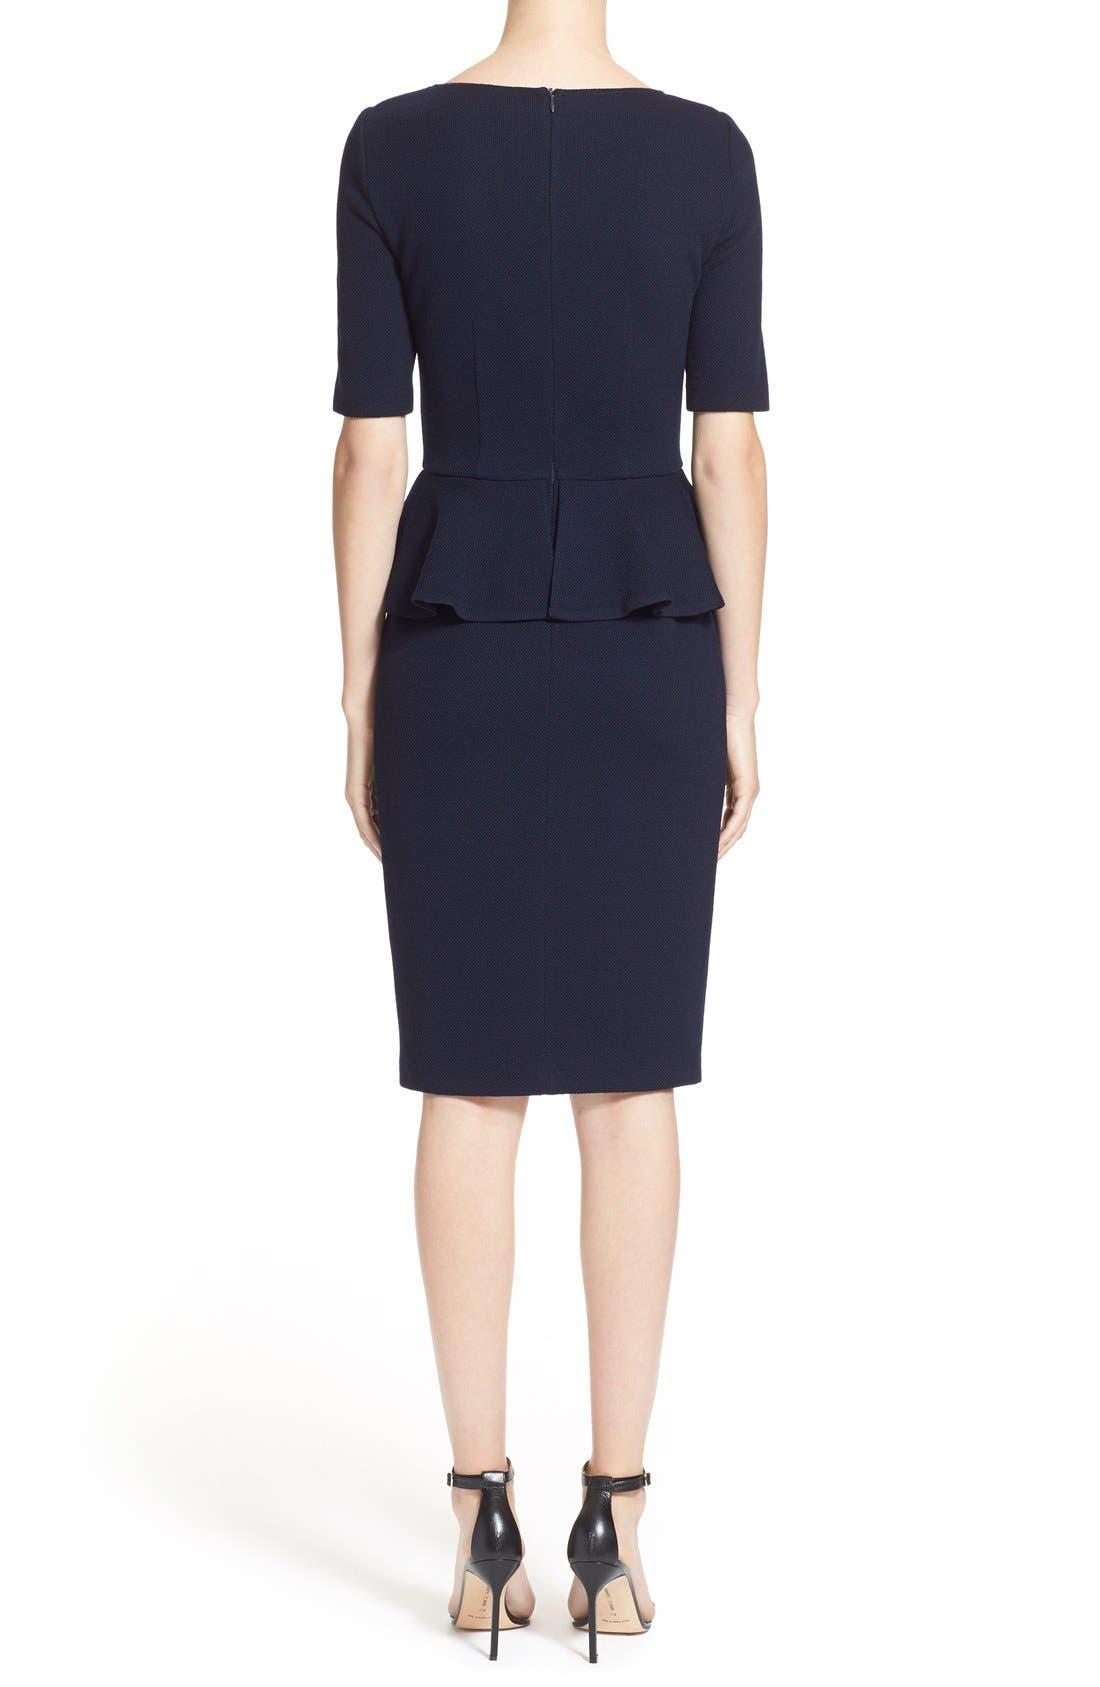 Alternate Image 2  - St. John Collection Peplum Milano Piqué Knit Dress